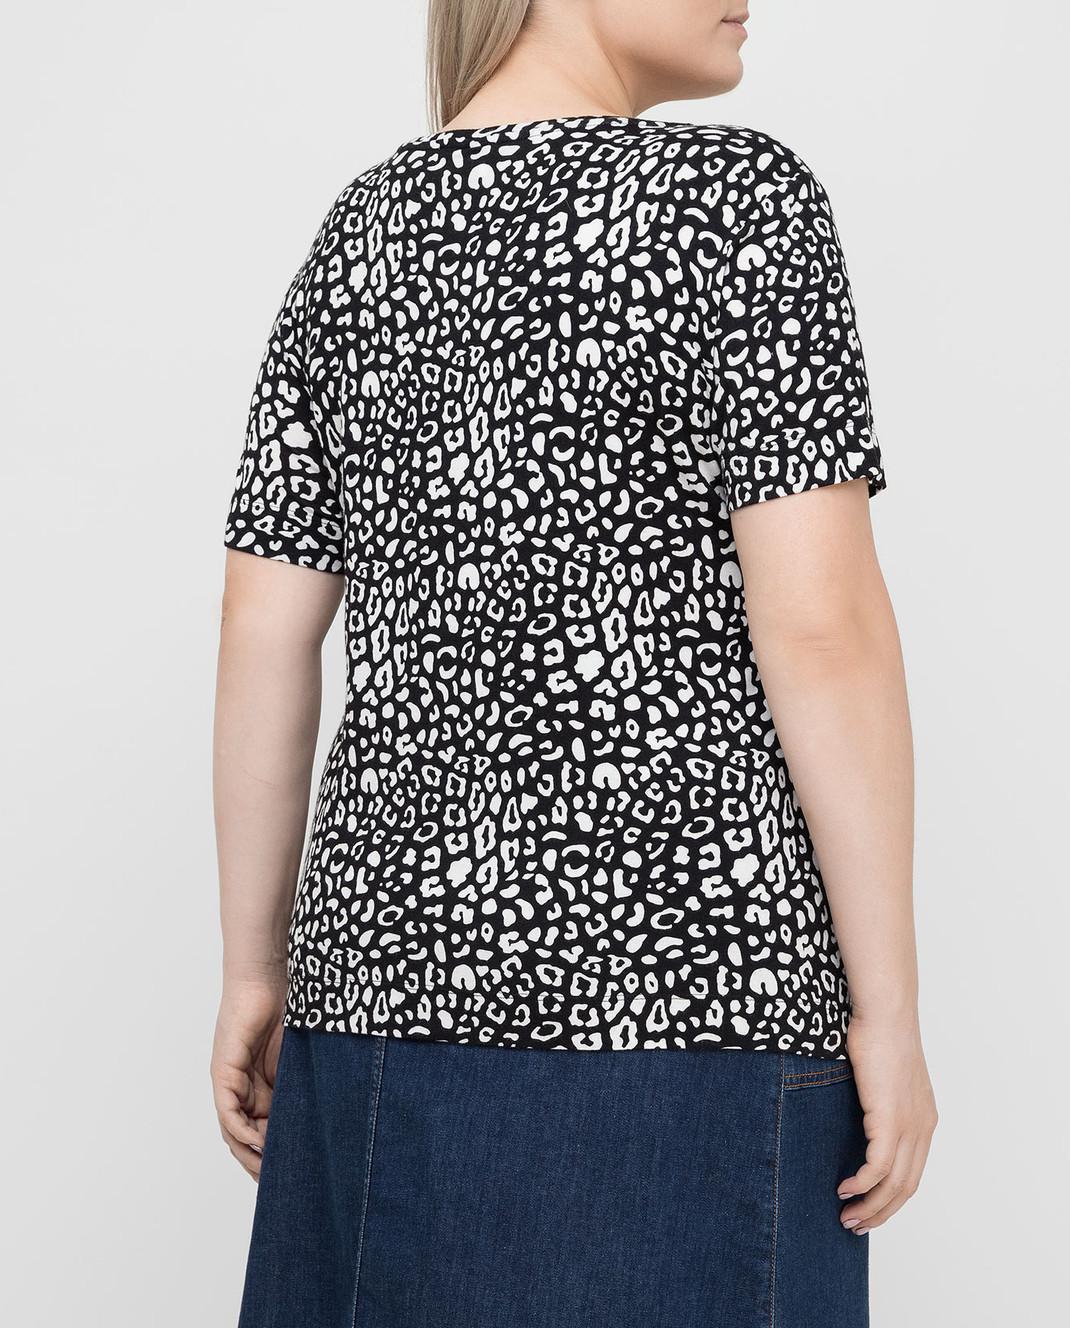 Marina Rinaldi Черная футболка изображение 4